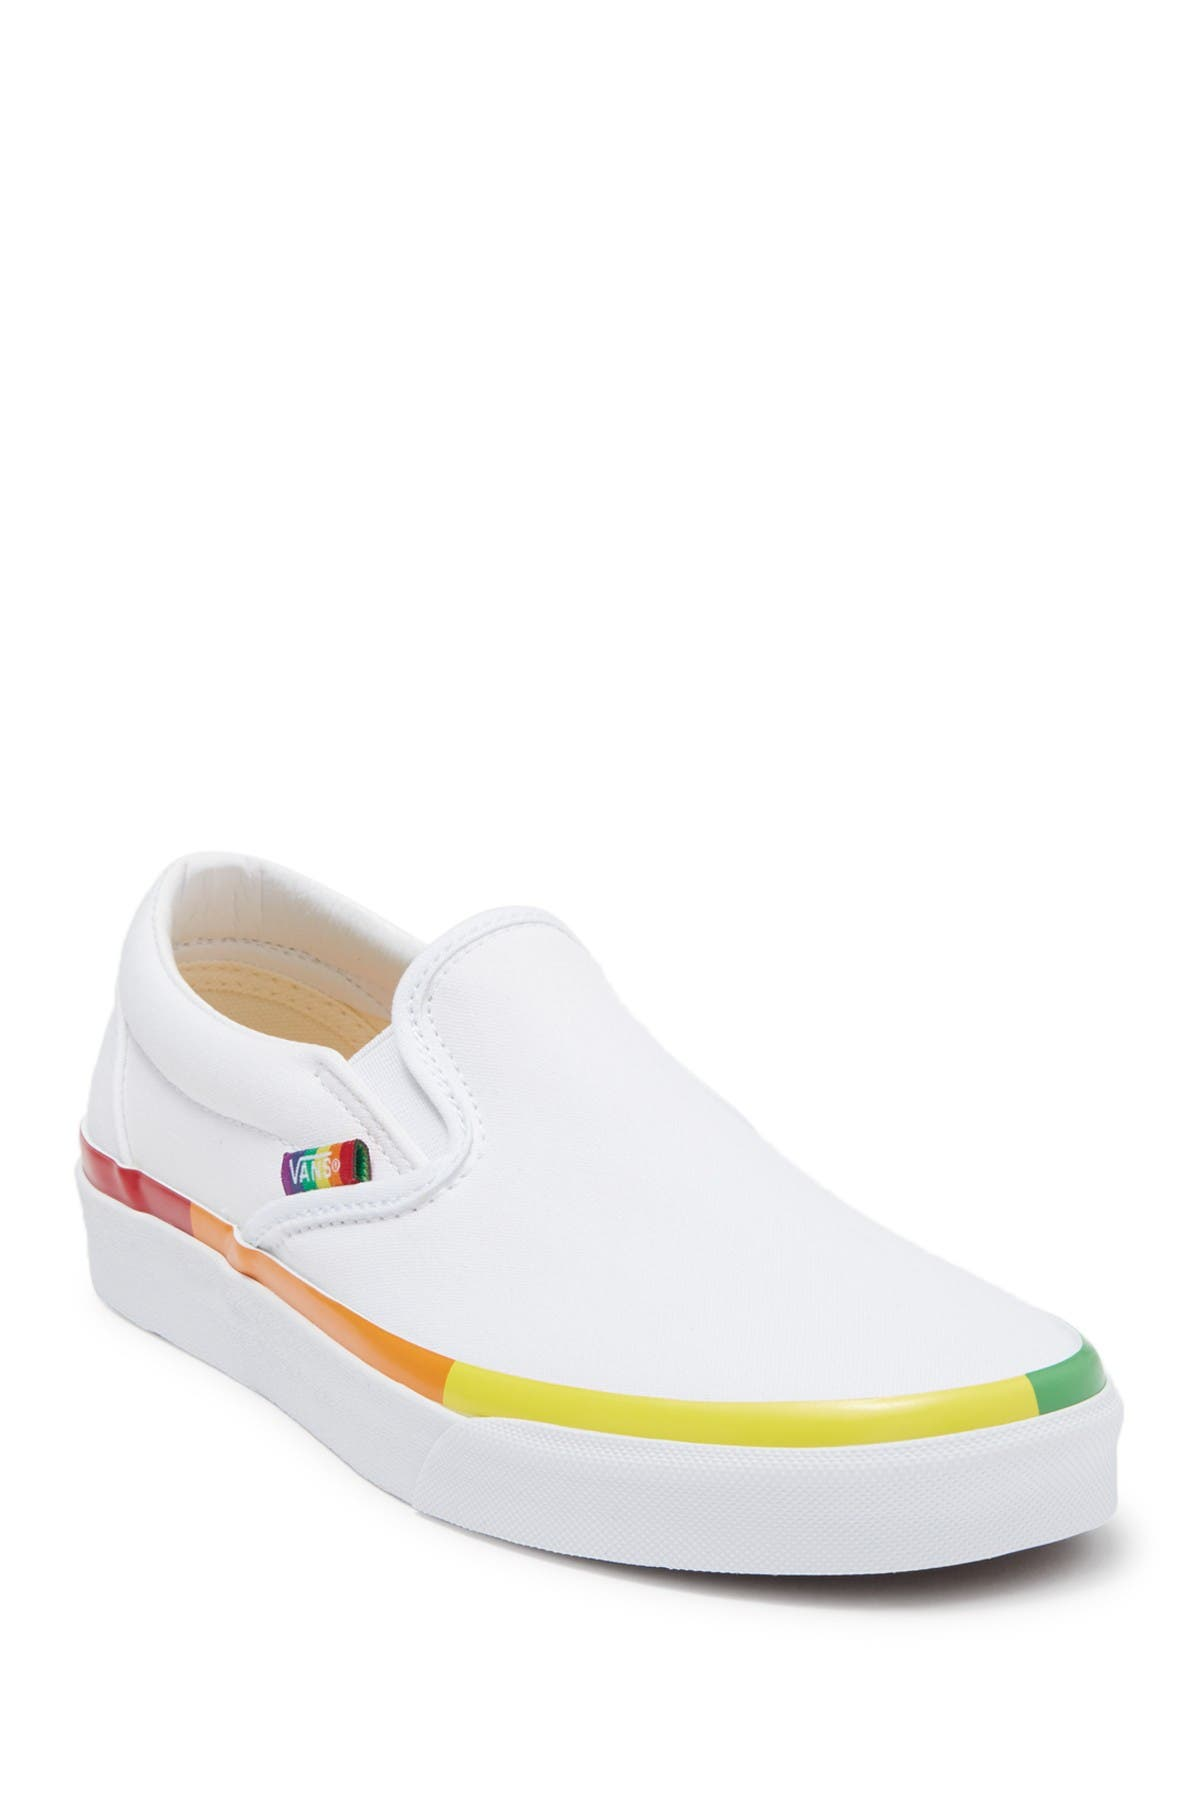 Image of VANS Van Classic Checkerboard Slip-On Sneaker